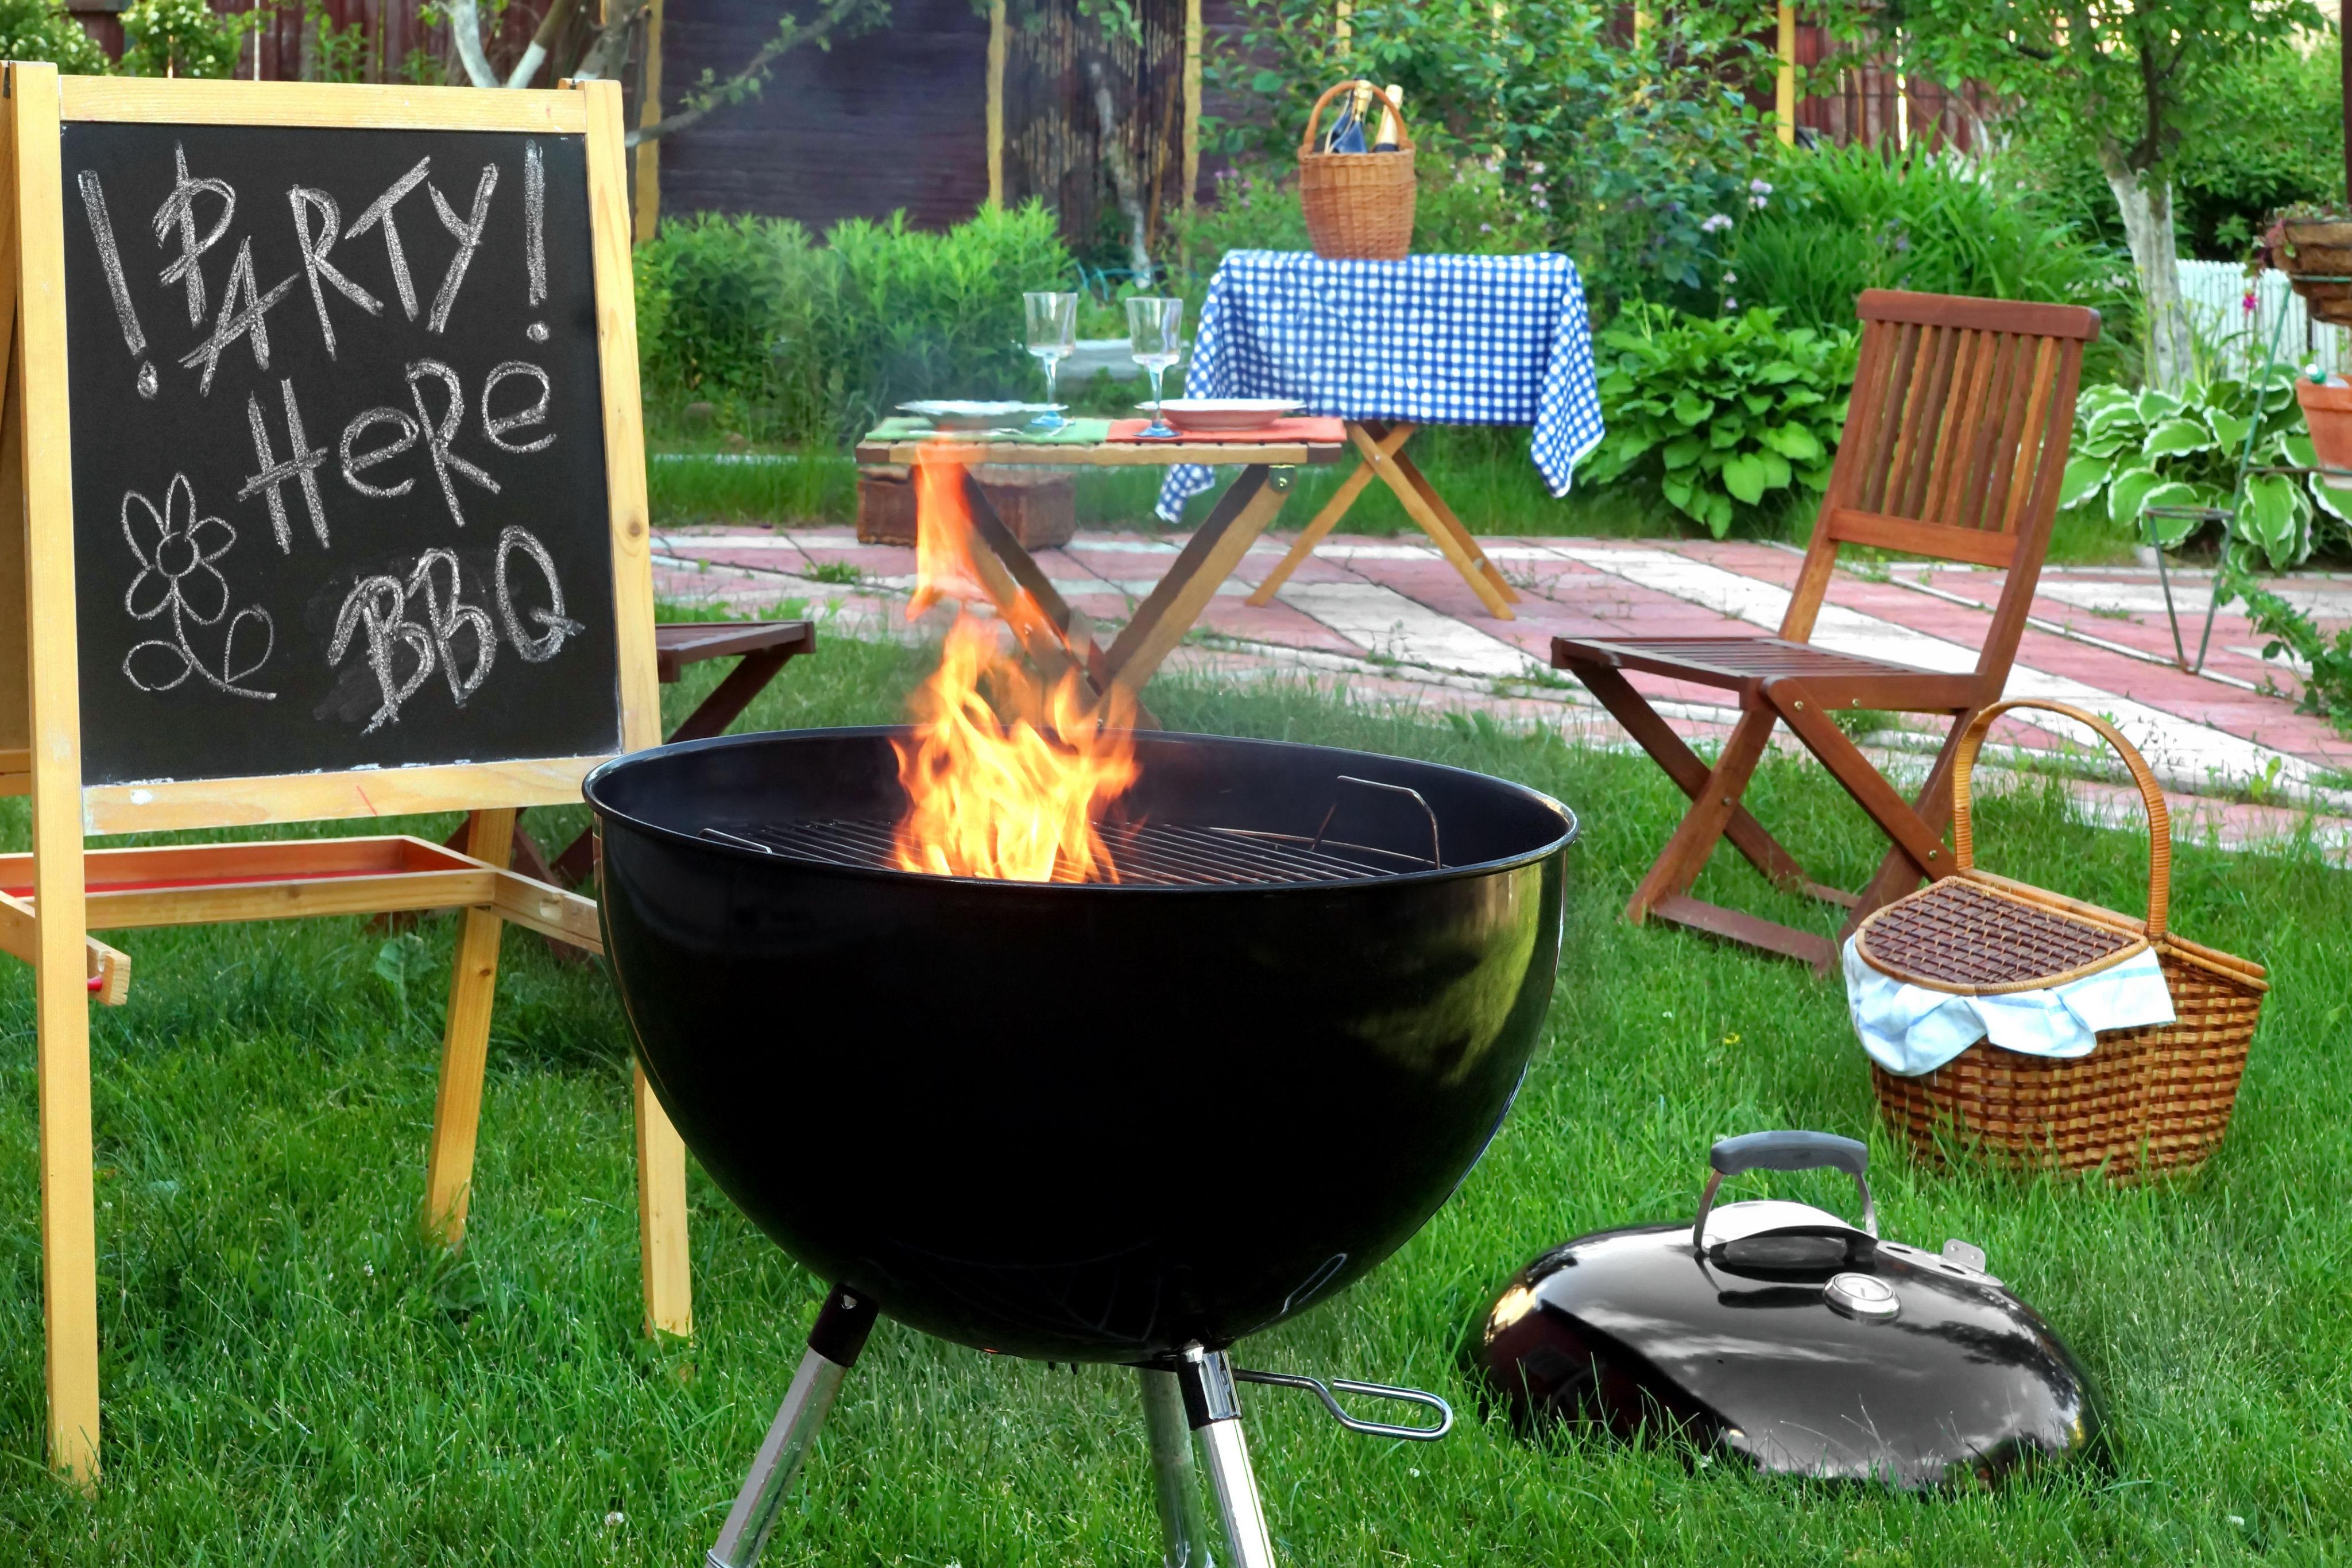 Backyard-BBQ-50-Birthday-Party